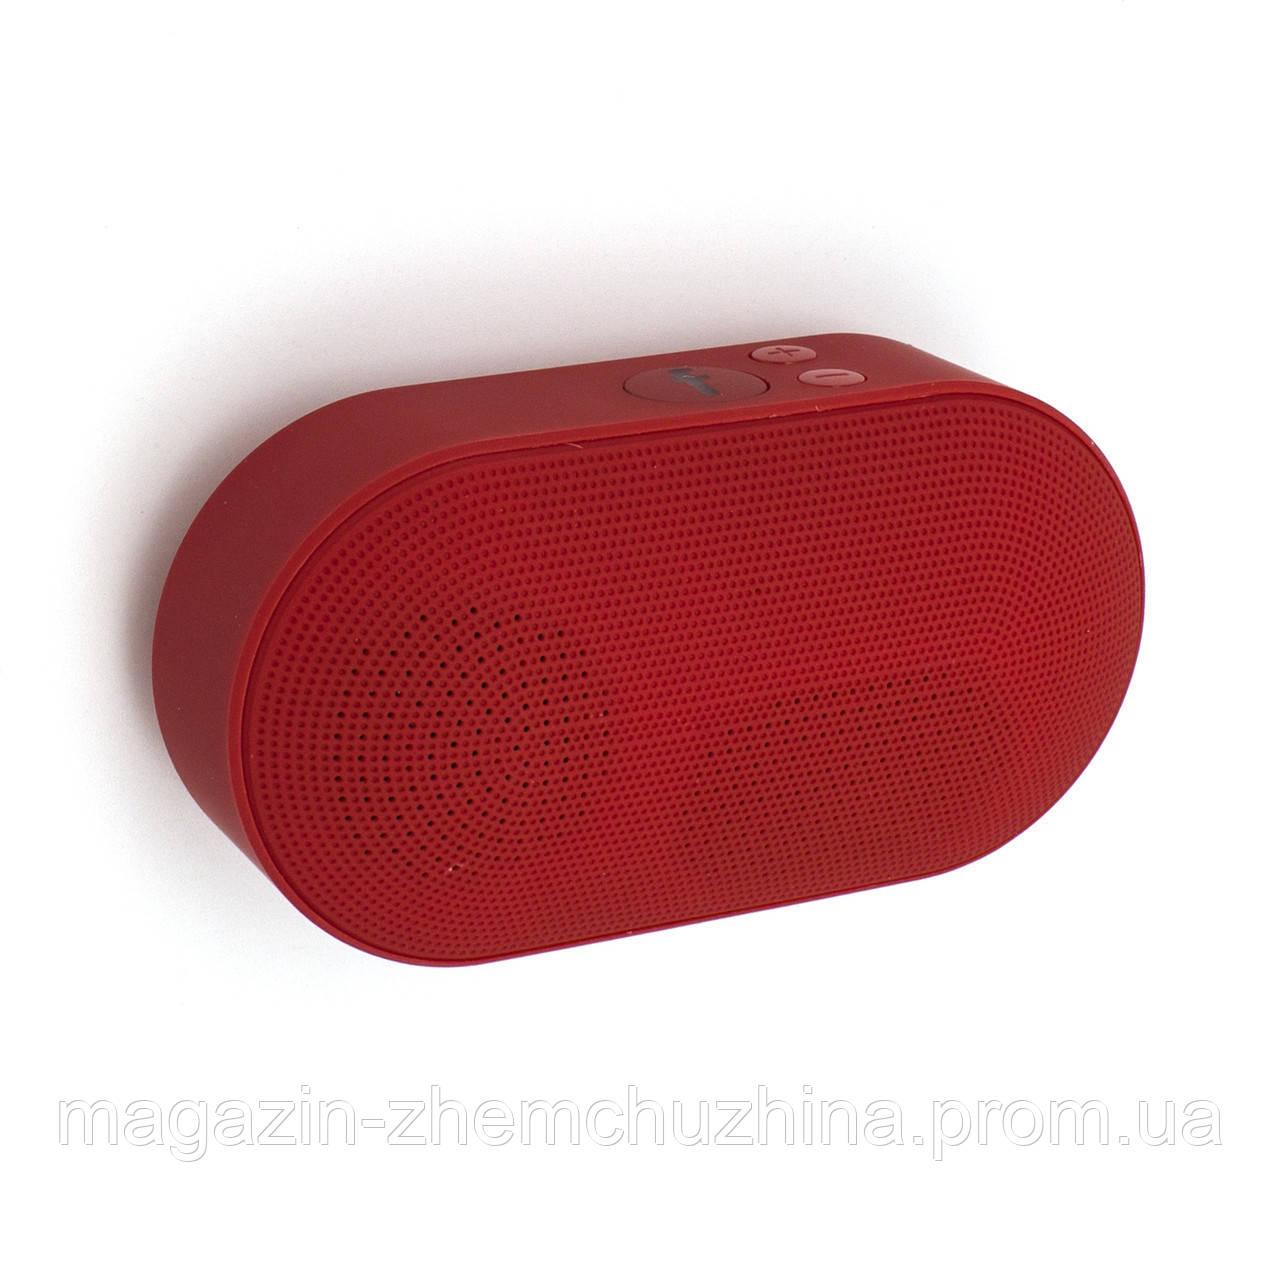 SALE! Портативная колонка Bluetooth J15